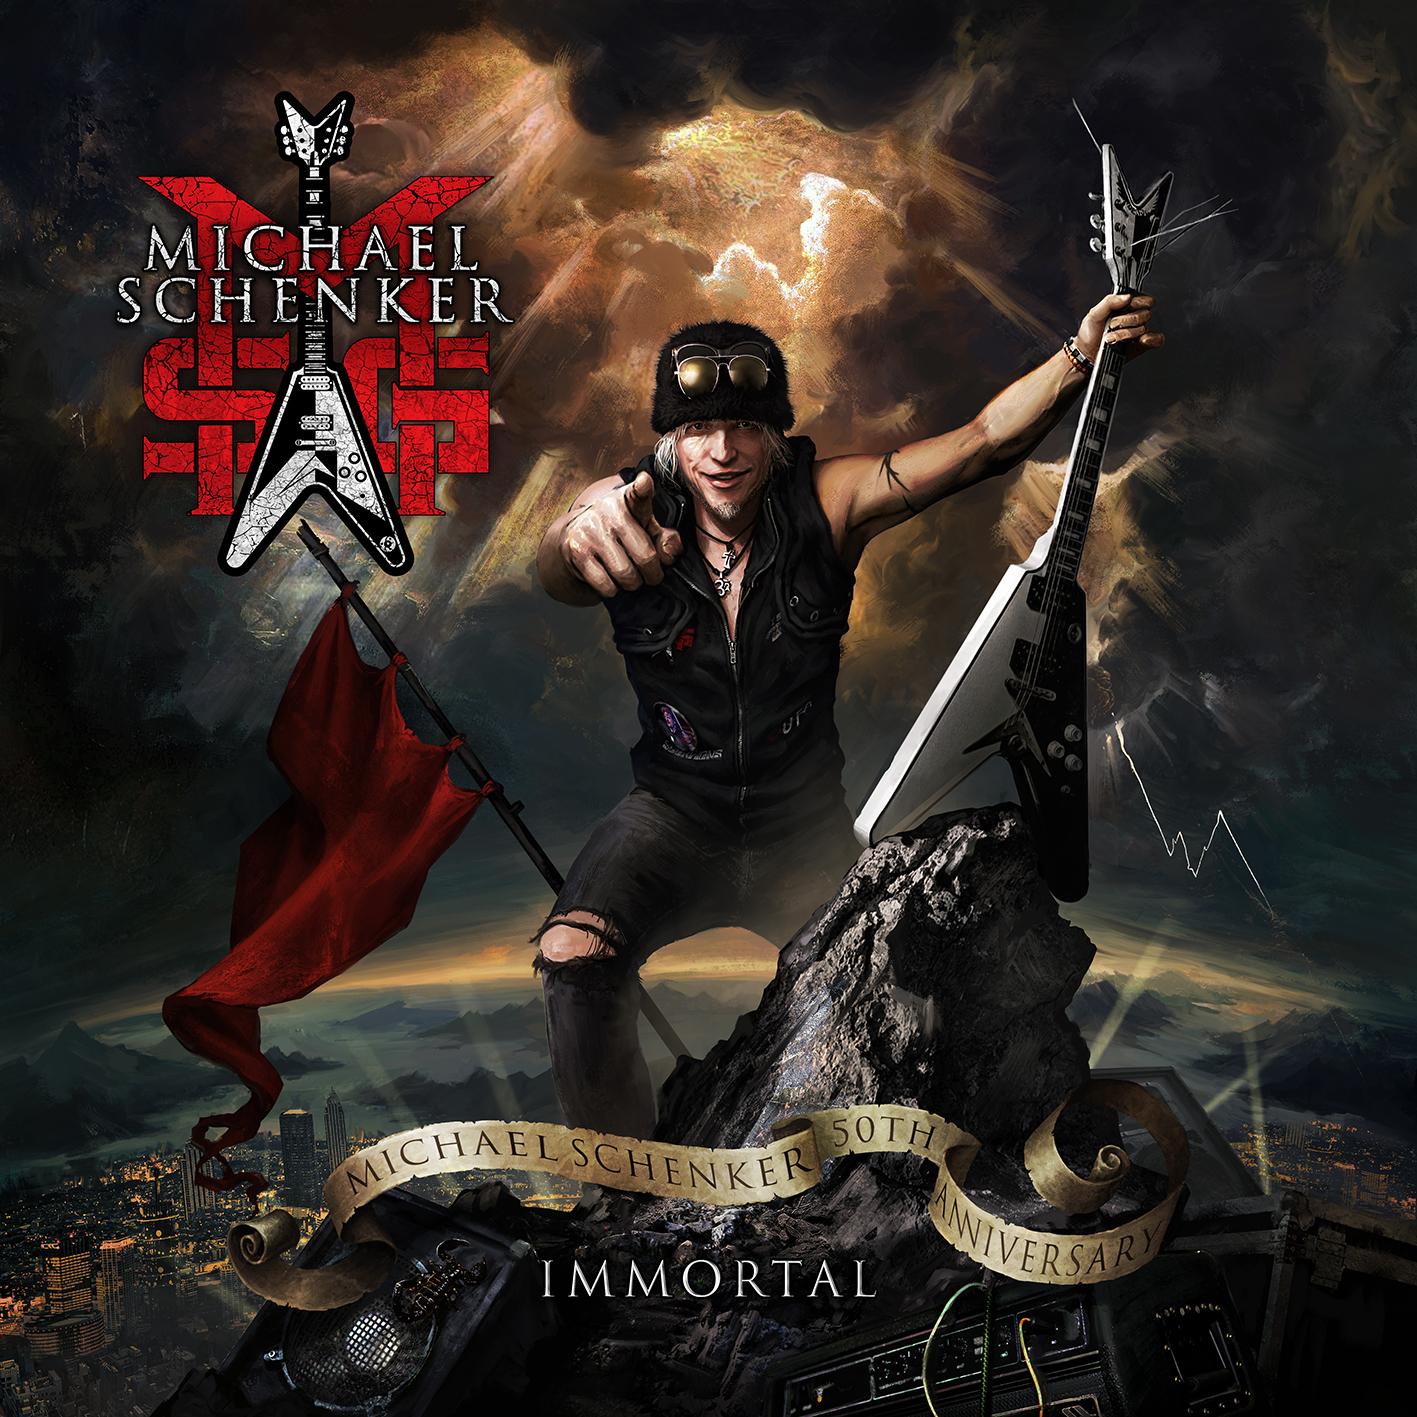 michael-schenker-enthuellt-das-cover-artwork-des-kommenden-msg-studioalbums-immortal